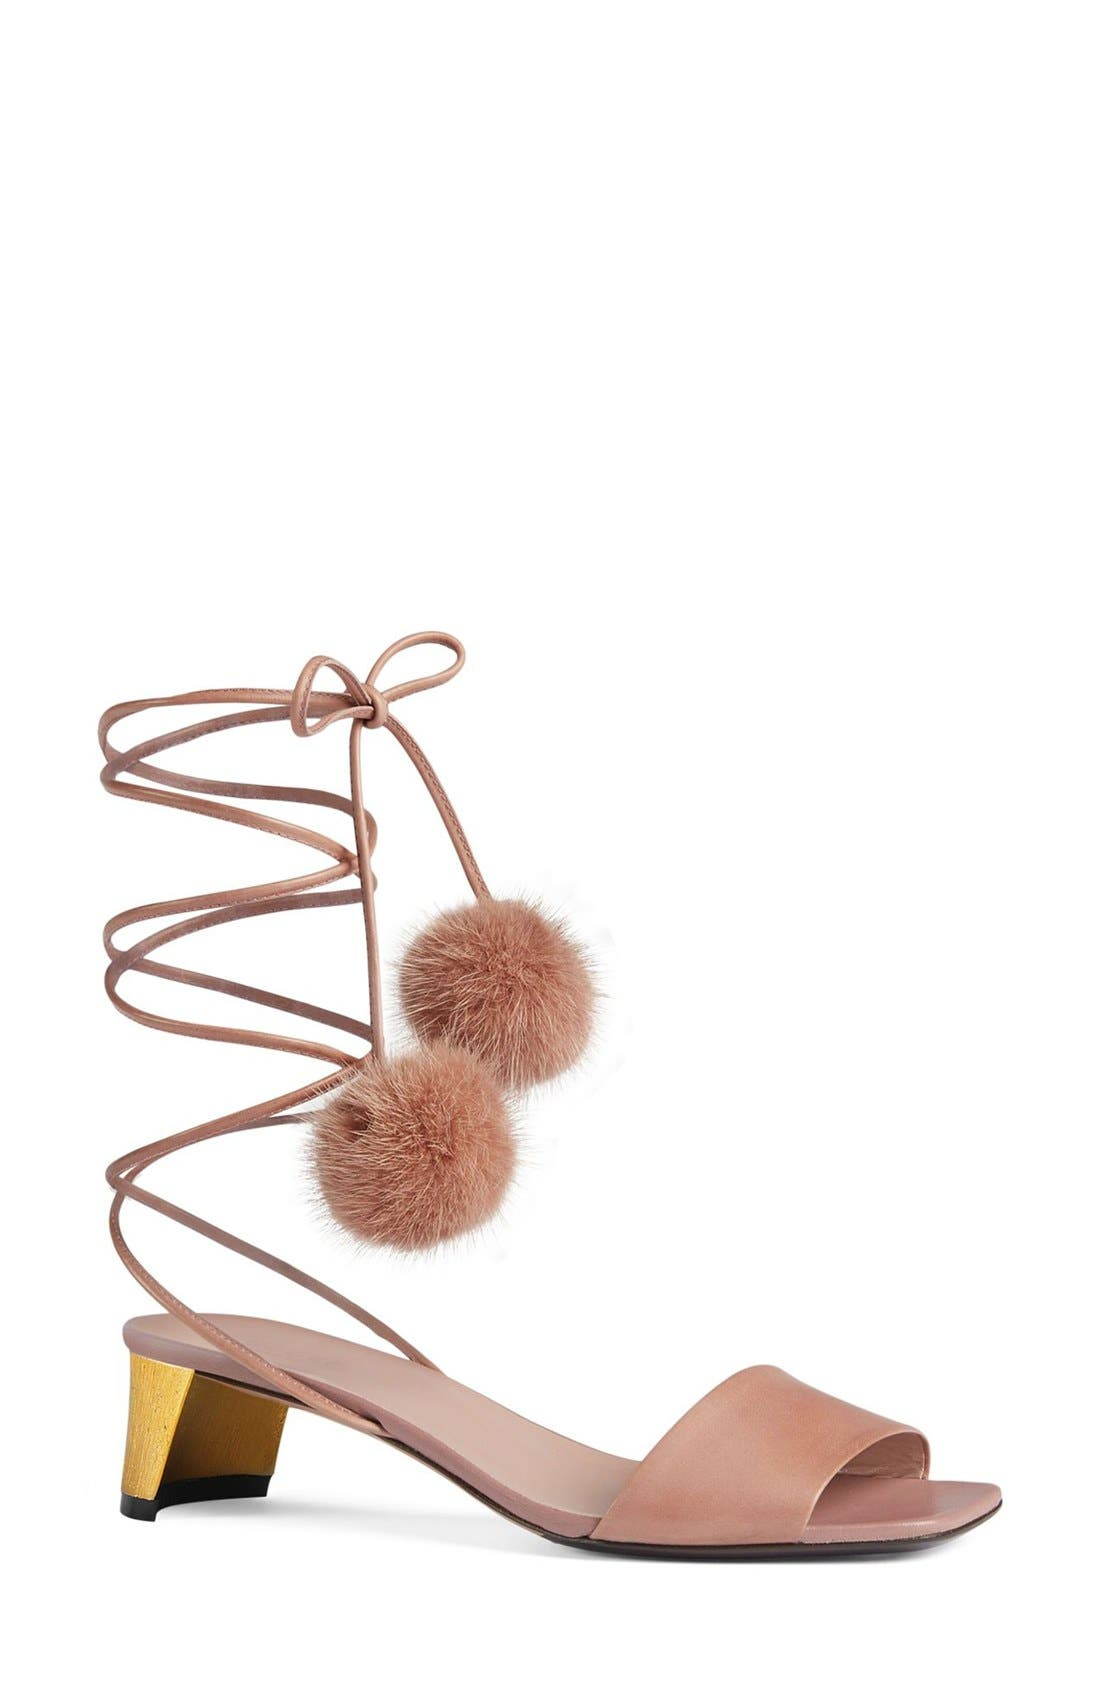 Main Image - Gucci 'Heloise' Sandal (Women)